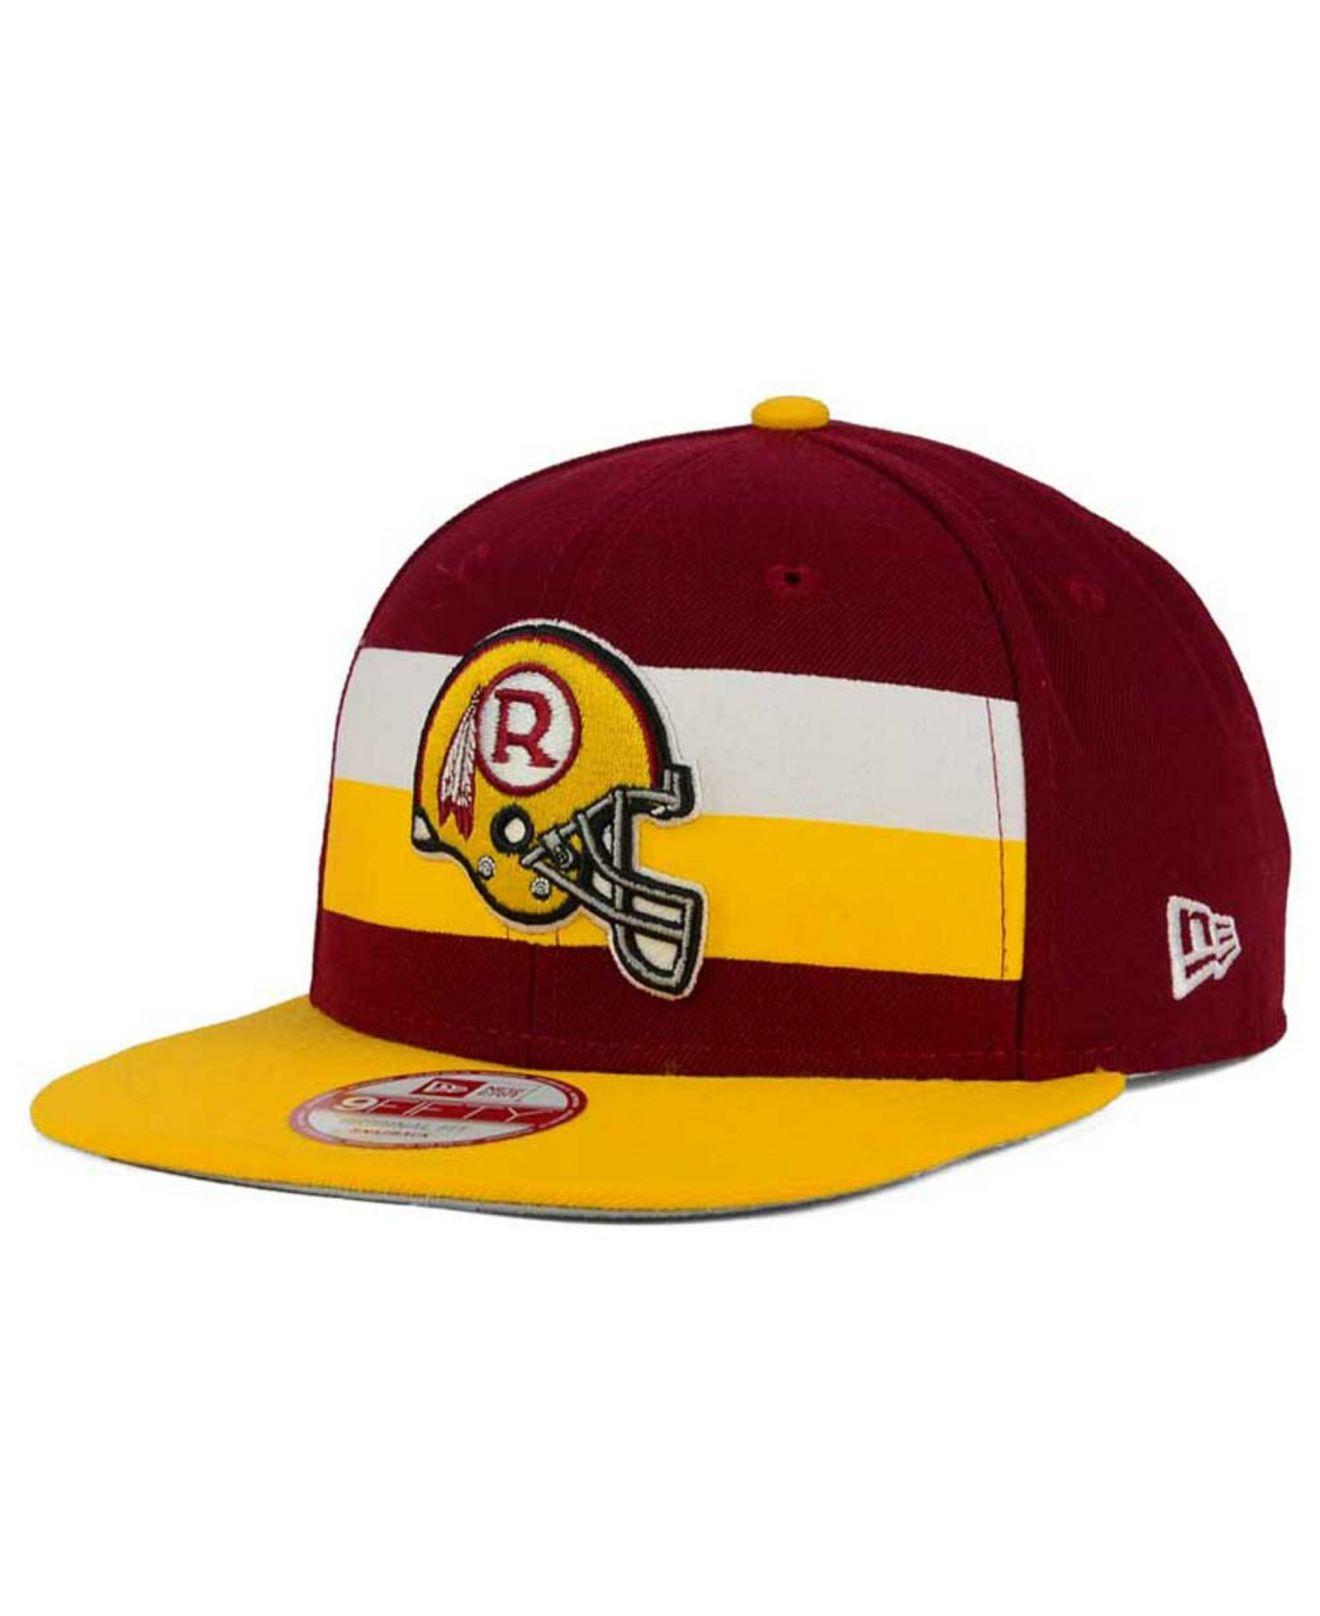 Lyst - KTZ Washington Redskins Retro Striped 9fifty Snapback Cap in ... 085b412d6